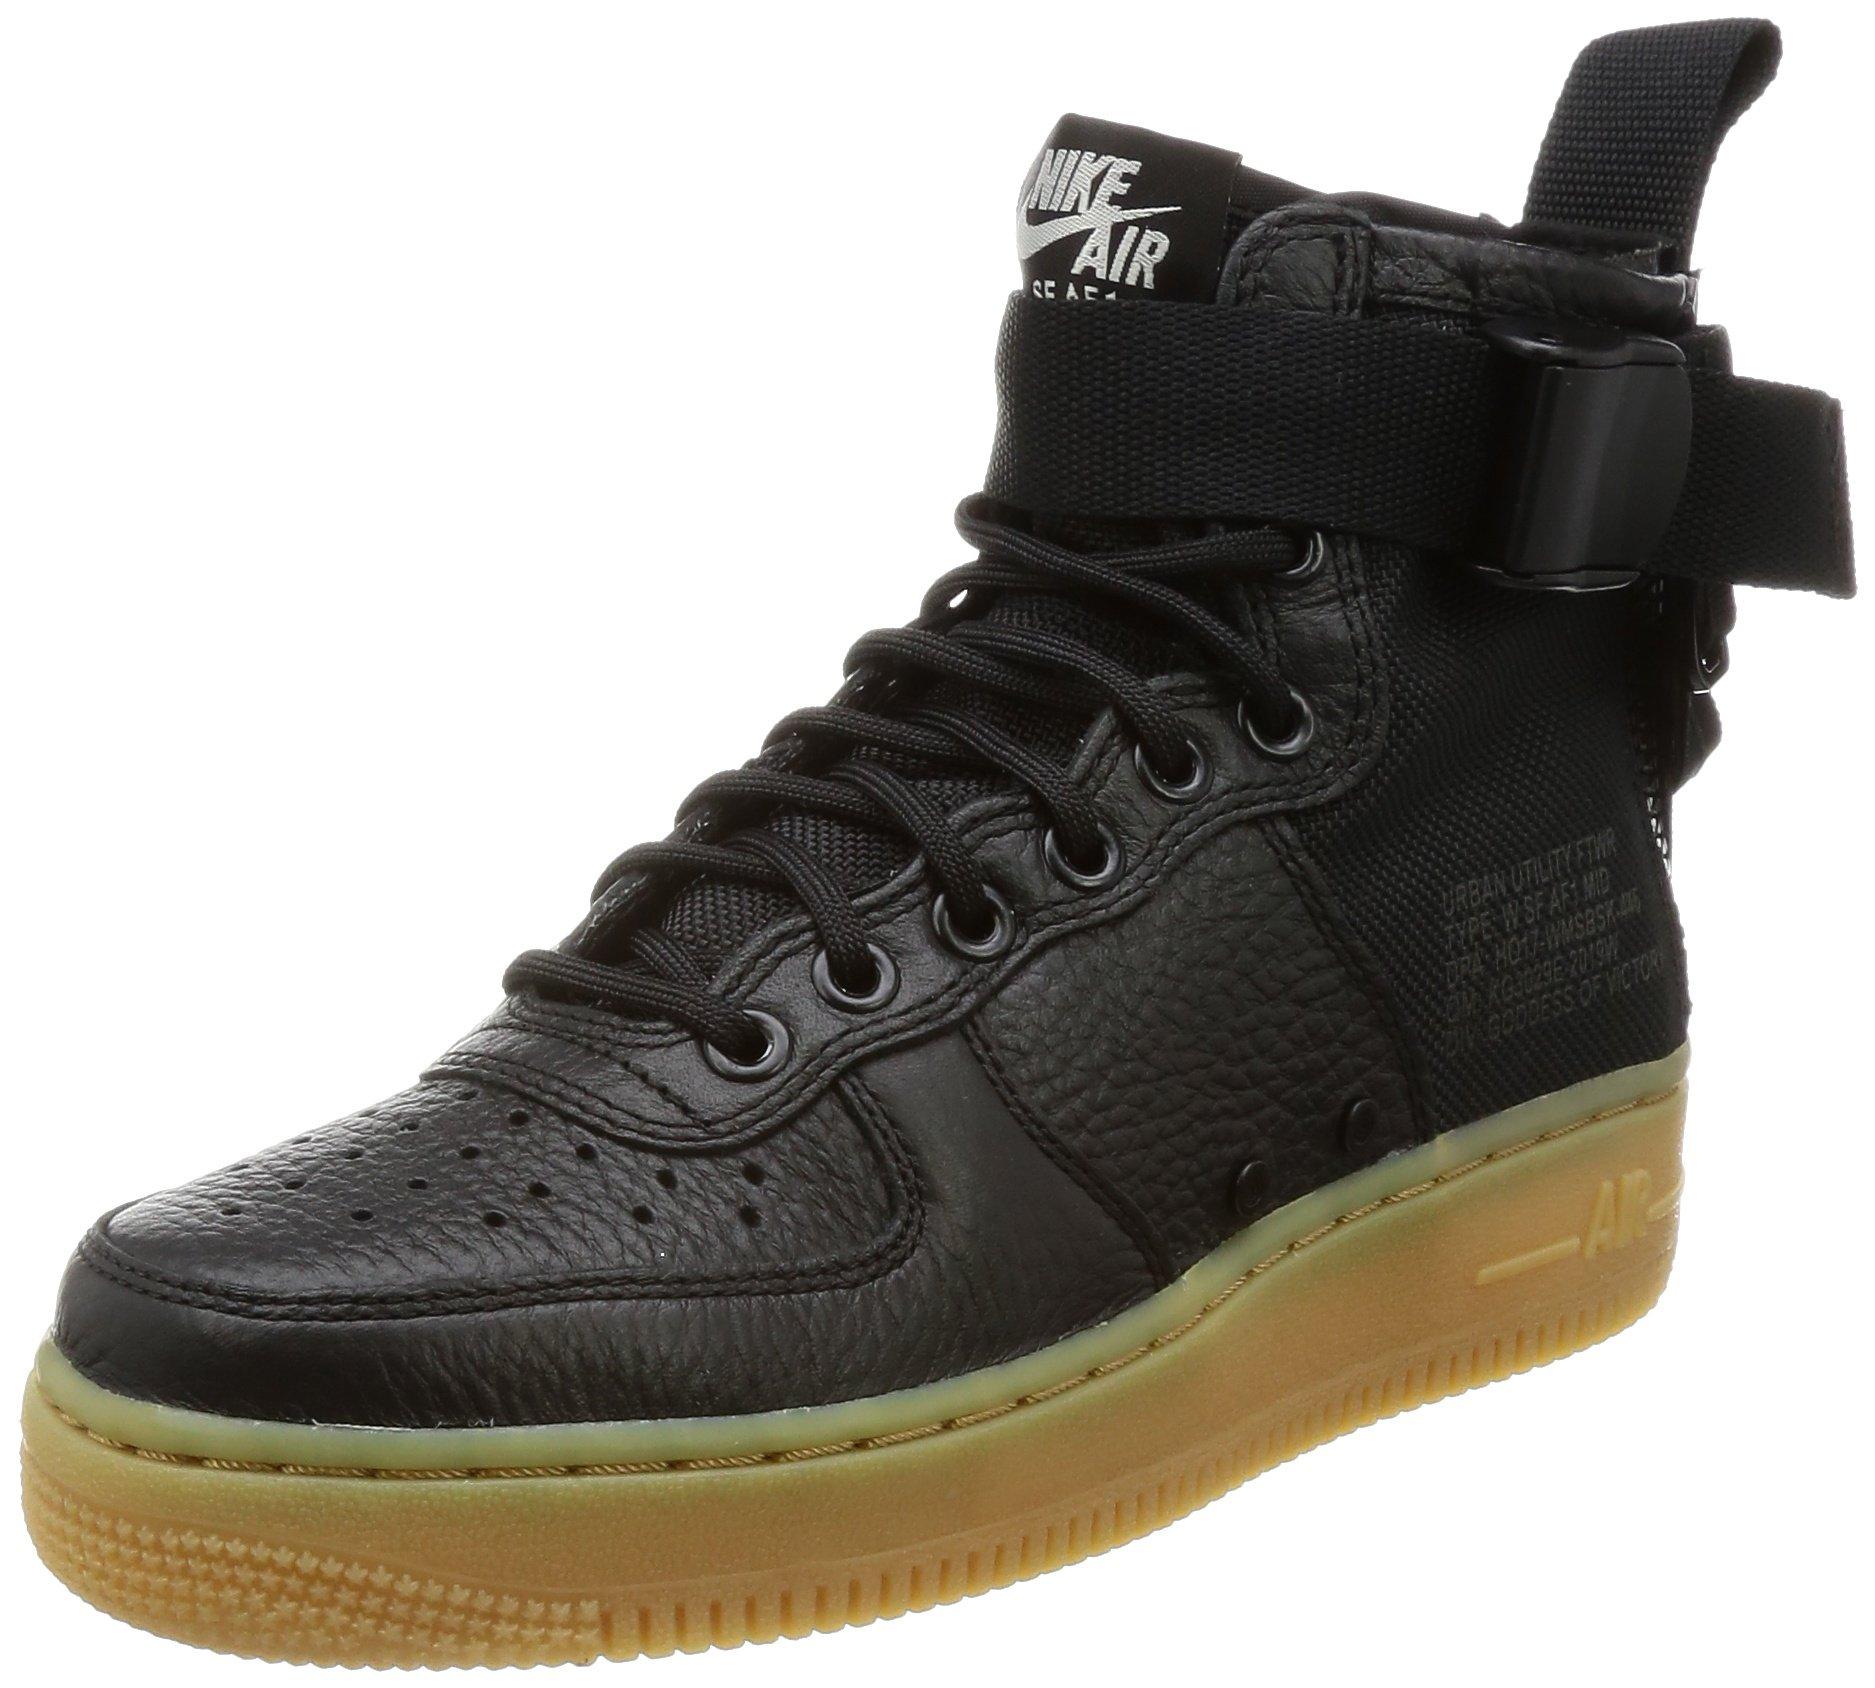 41e5045b7 Galleon - Nike Women's SF AF1 Mid Basketball Shoe 6.5 Black